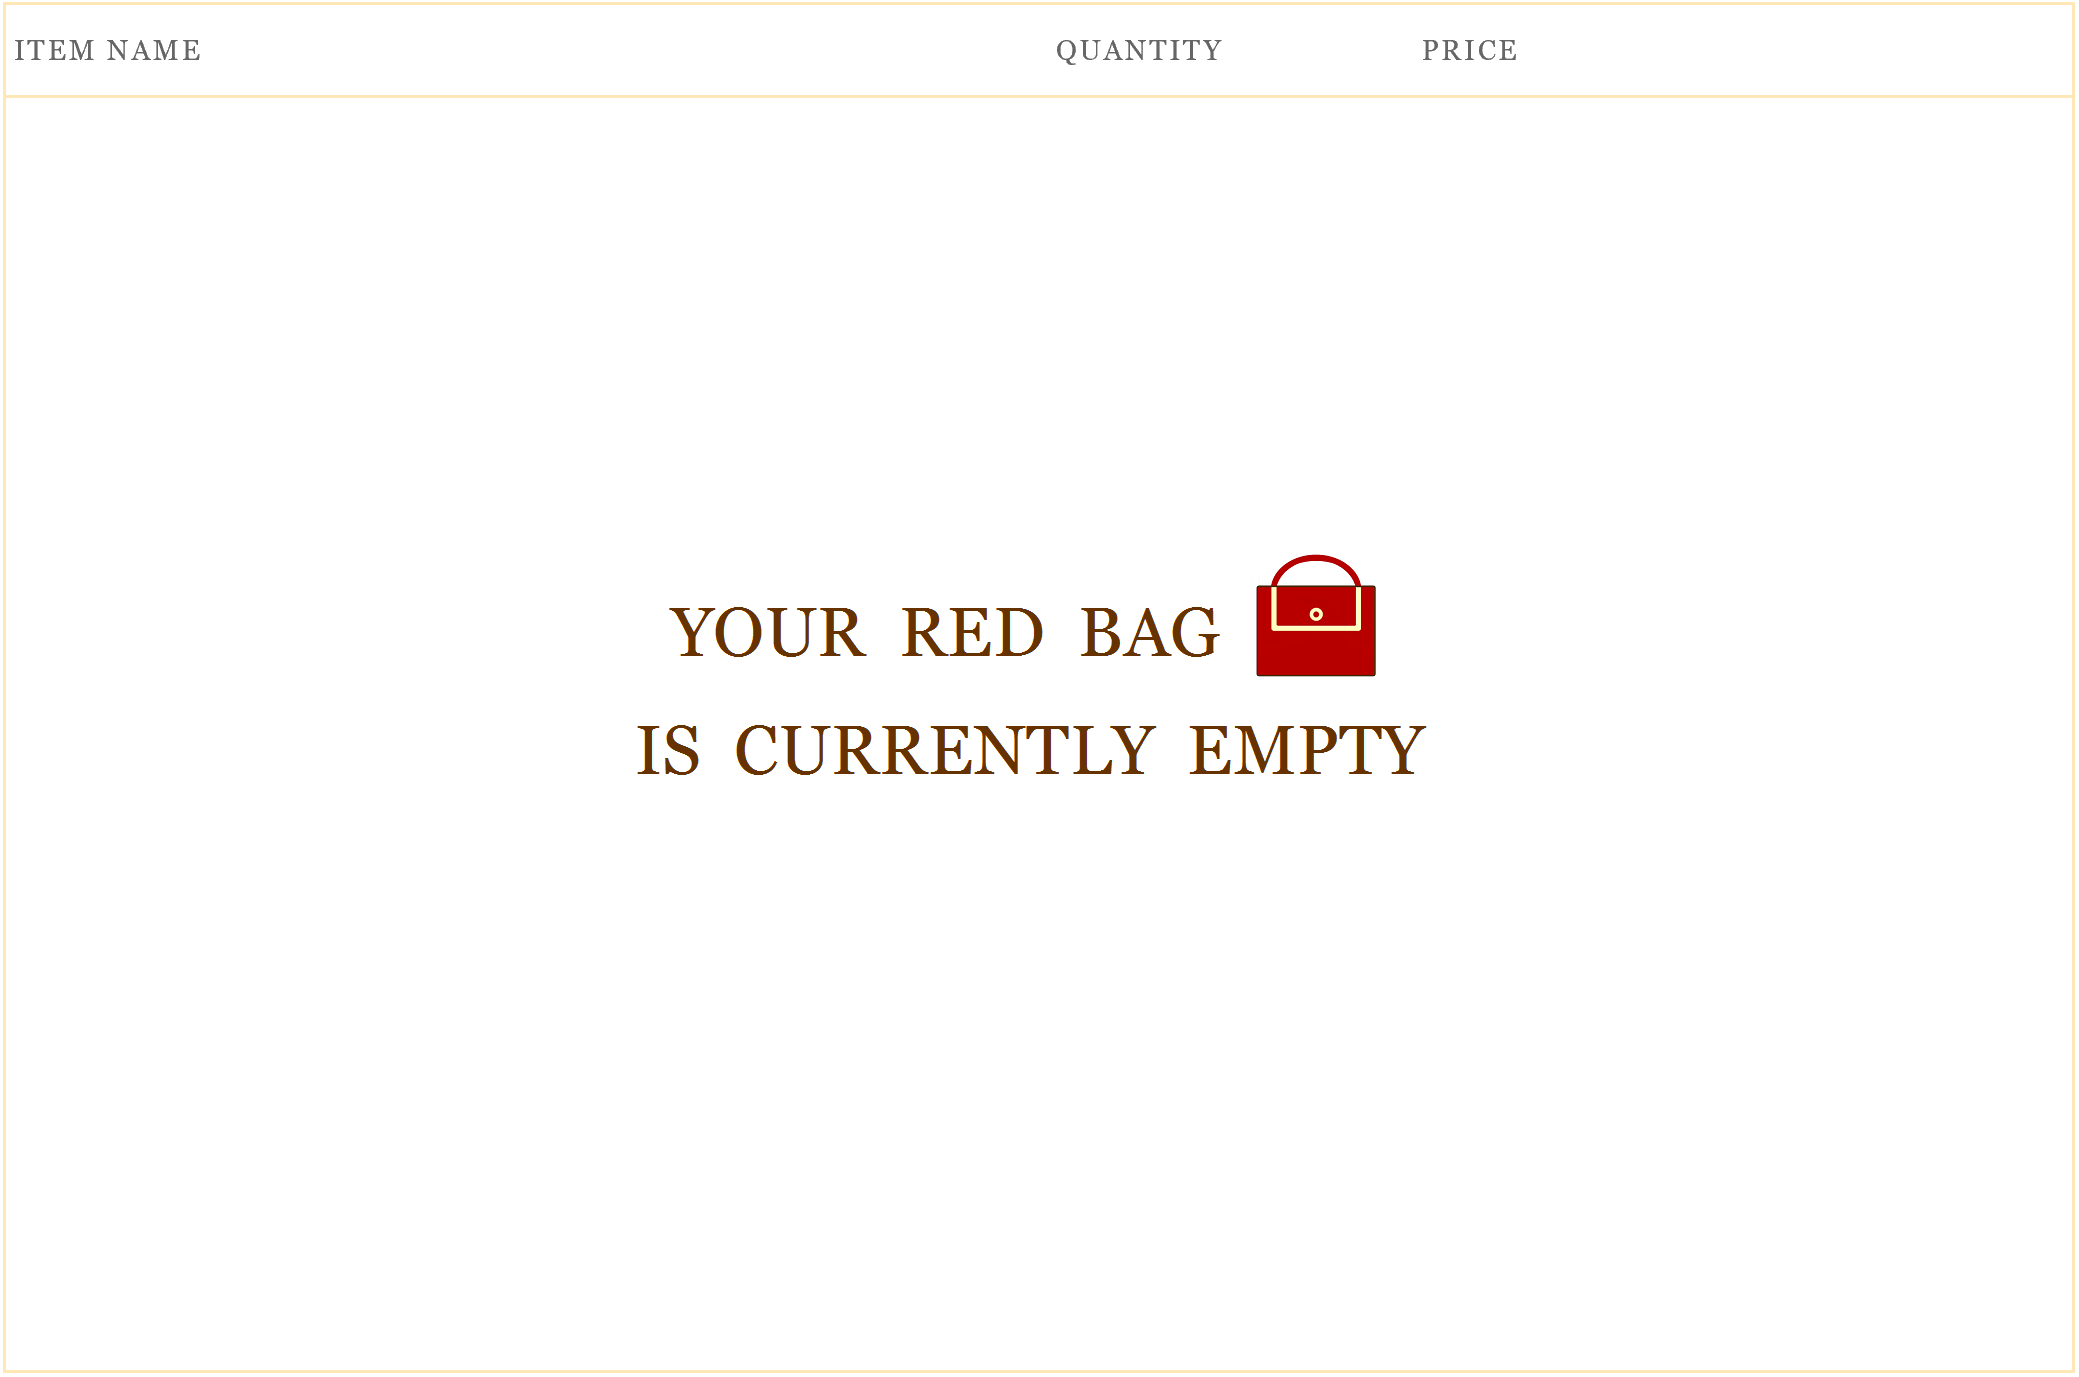 http://redkarawana.com/wp-content/uploads/2016/07/0k-ENG-Red-Bag-Empty-Image.png